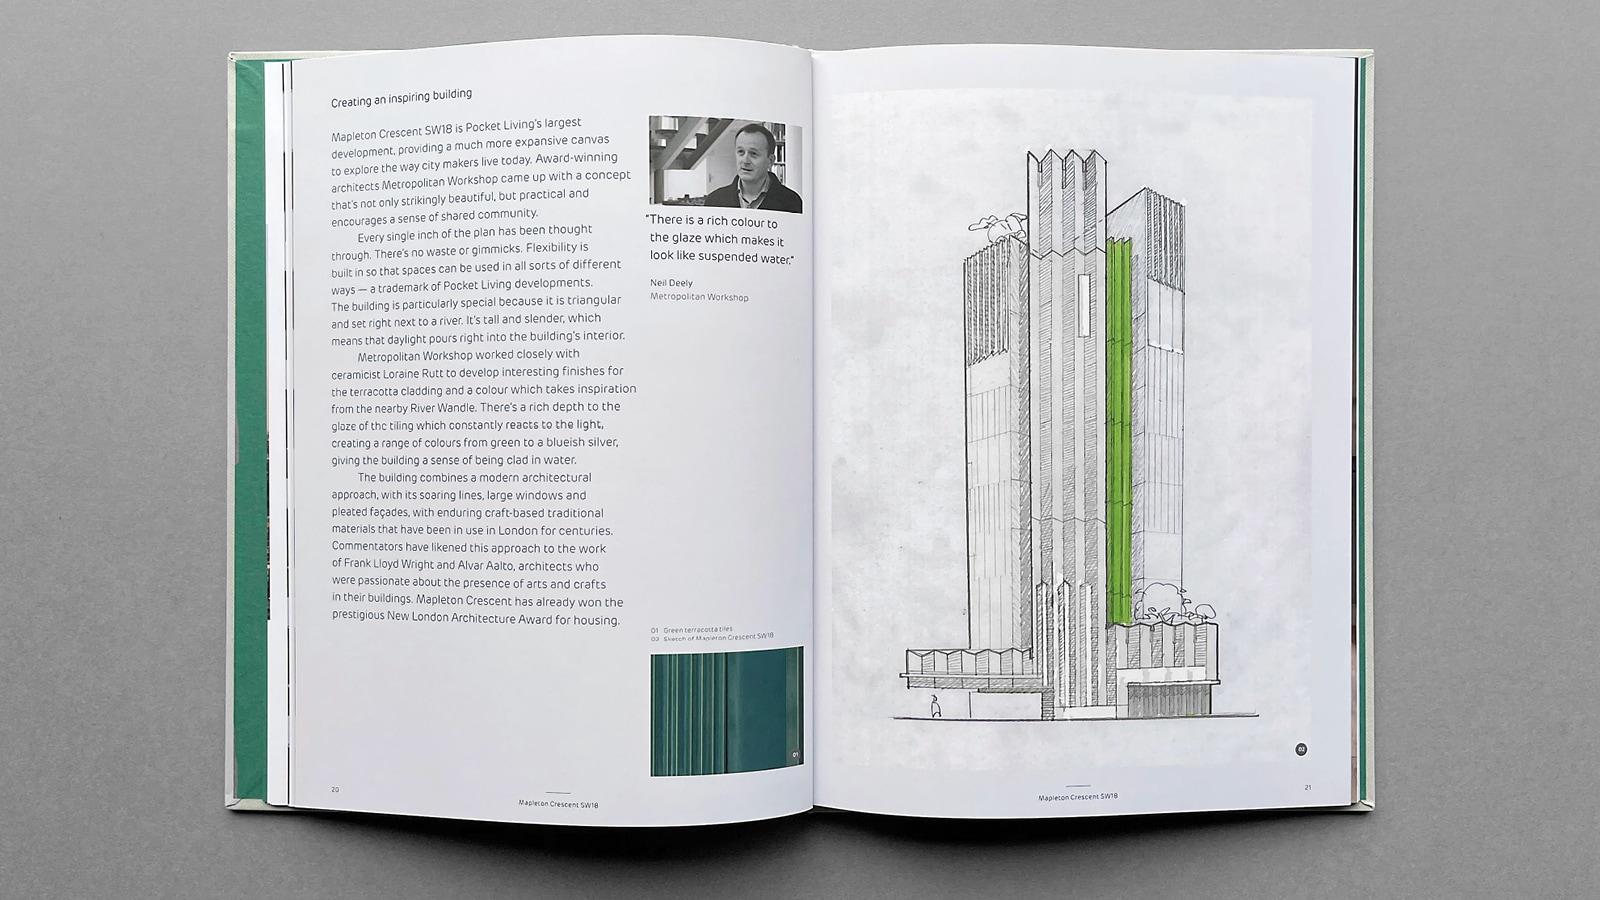 property-marketing-design-architecture-building-book-brochure-milton-keynes-london6